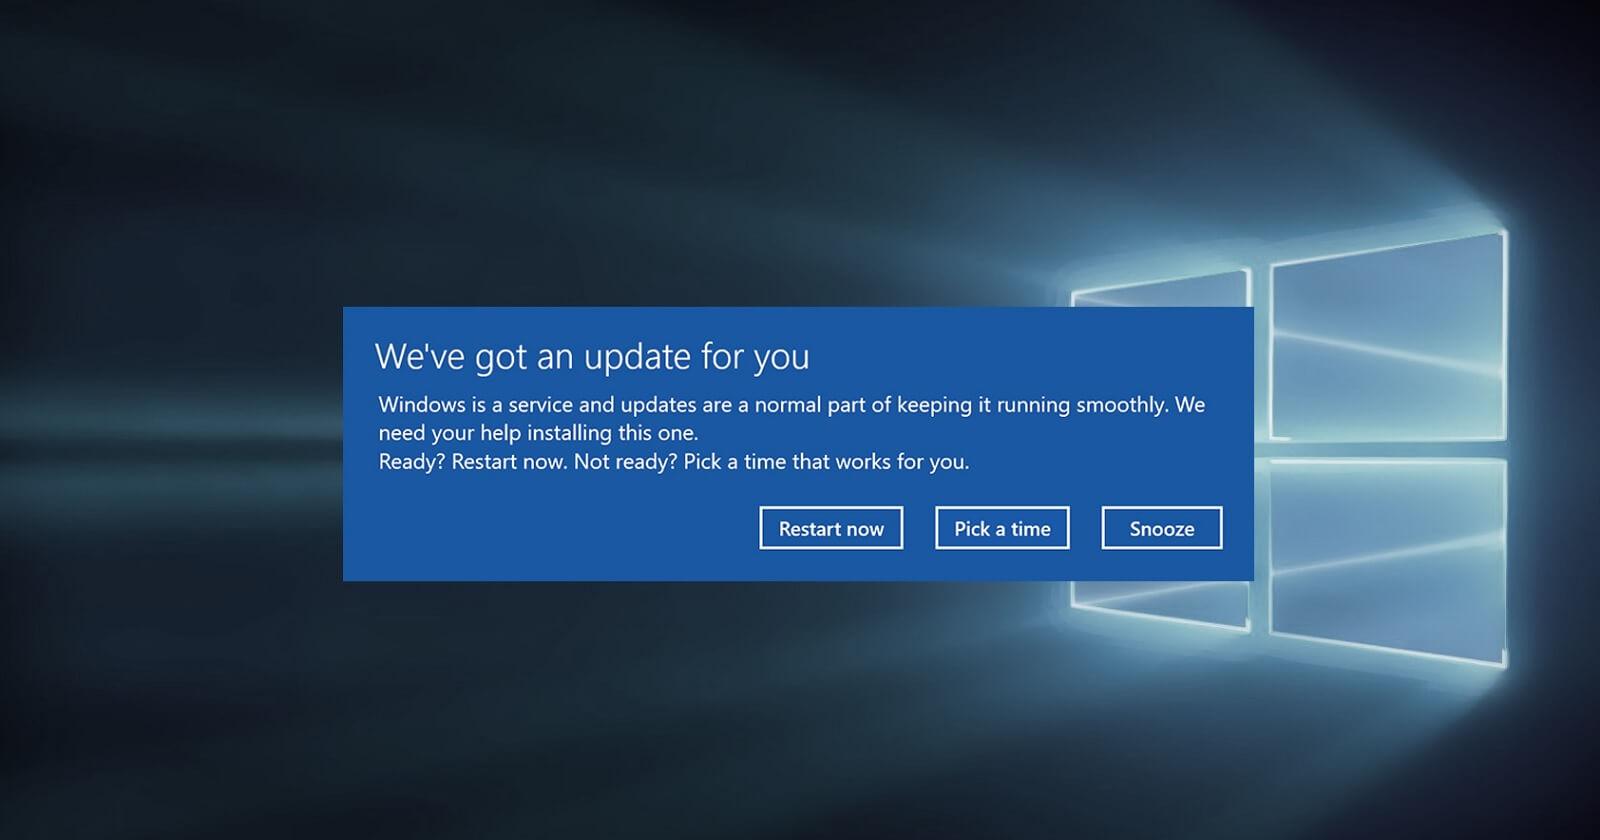 Windows 10 reboot